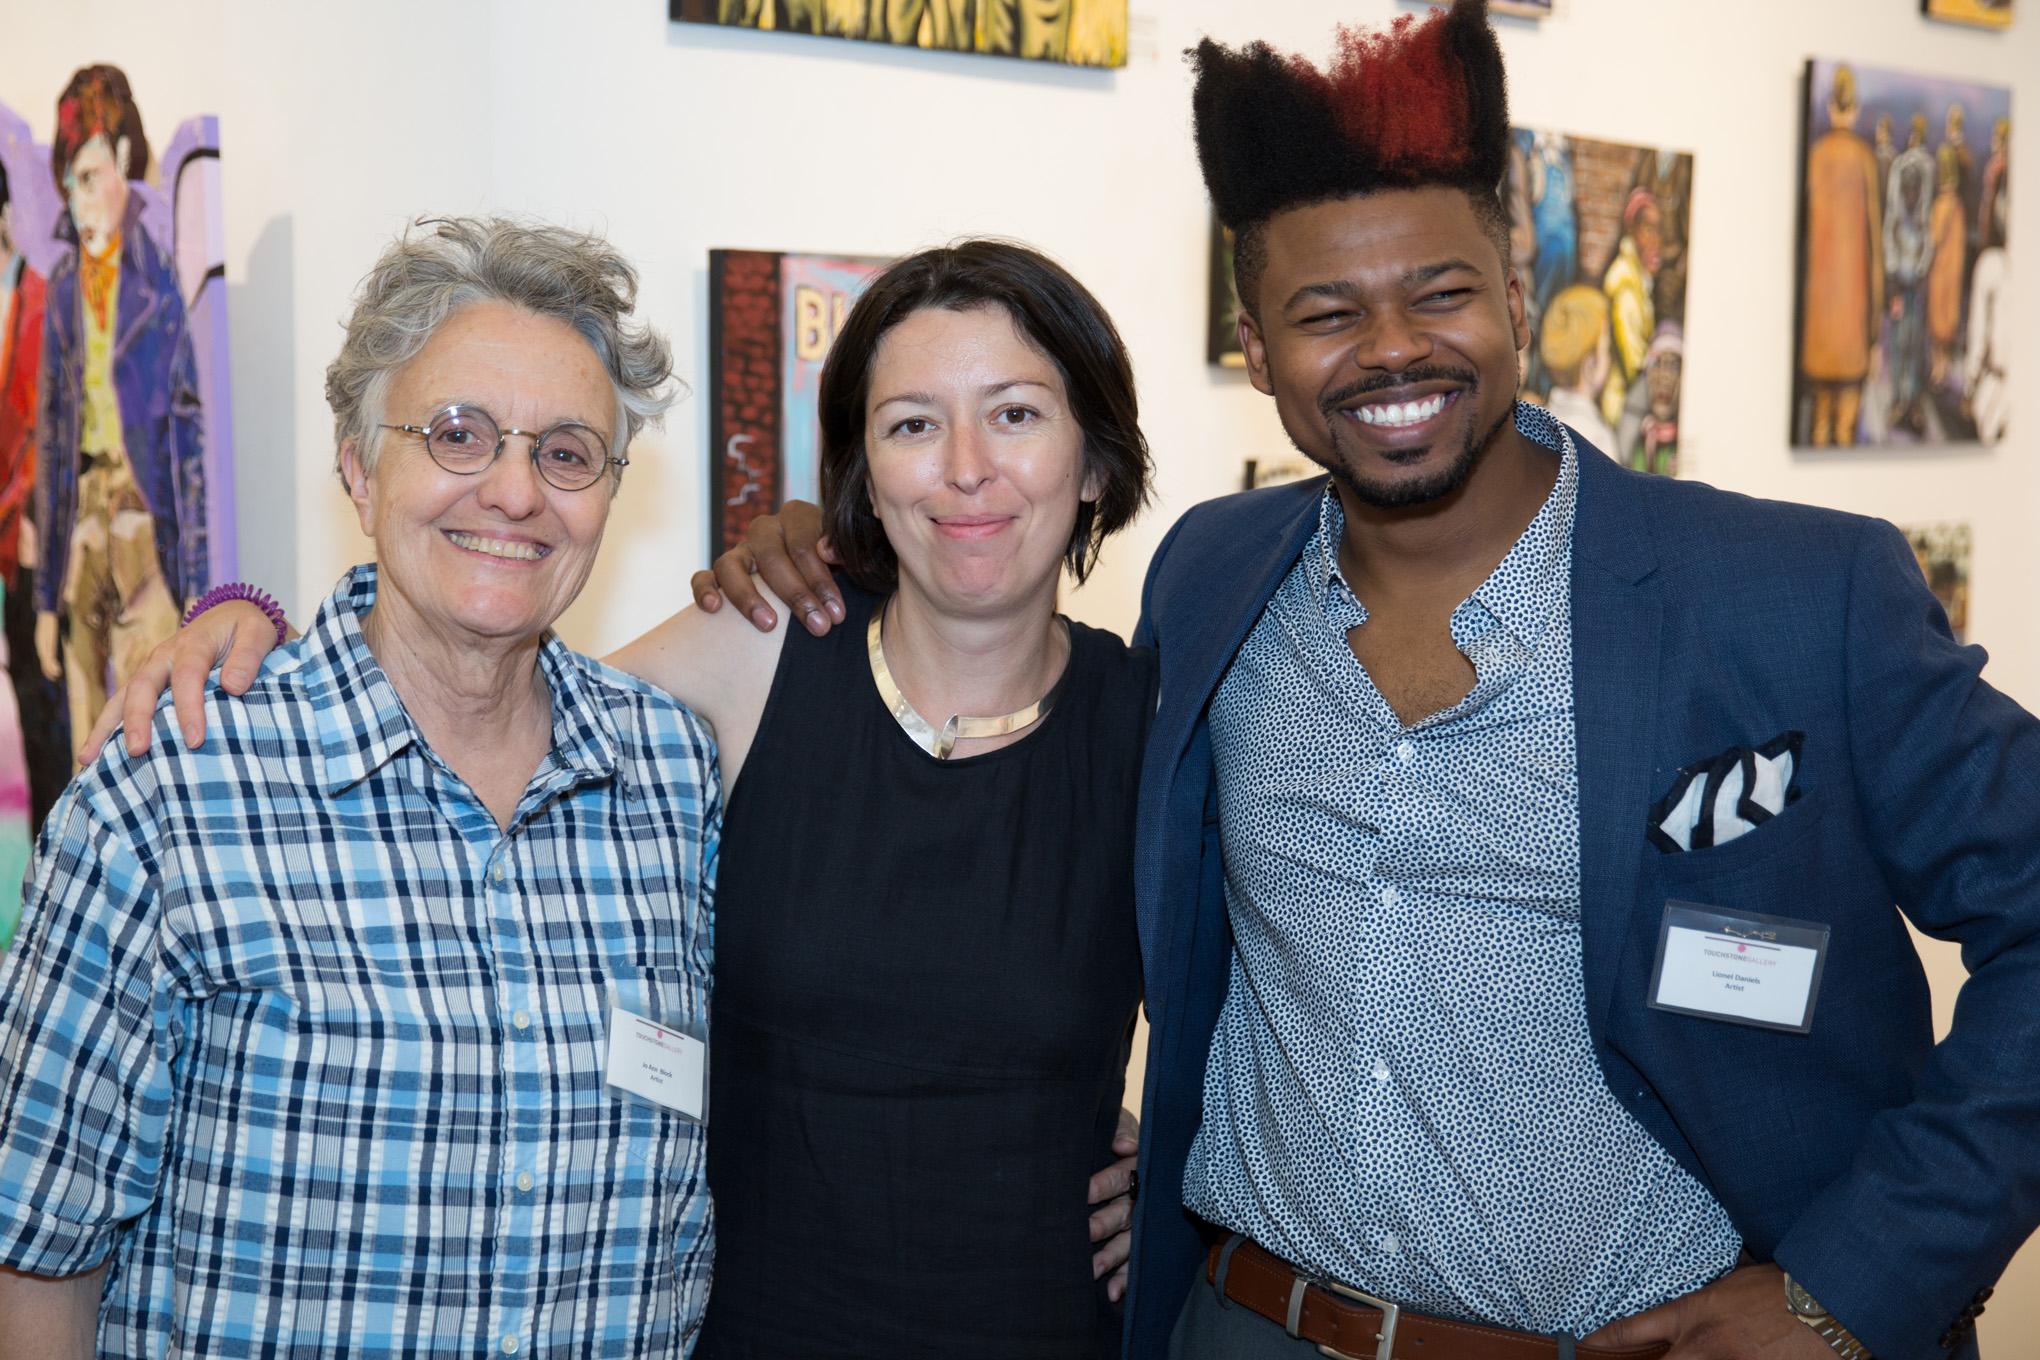 Jo-Ann Block, '15-'17, Ksenia Grishkova, TFA Executive Director and Lionel Daniels, '15-'17